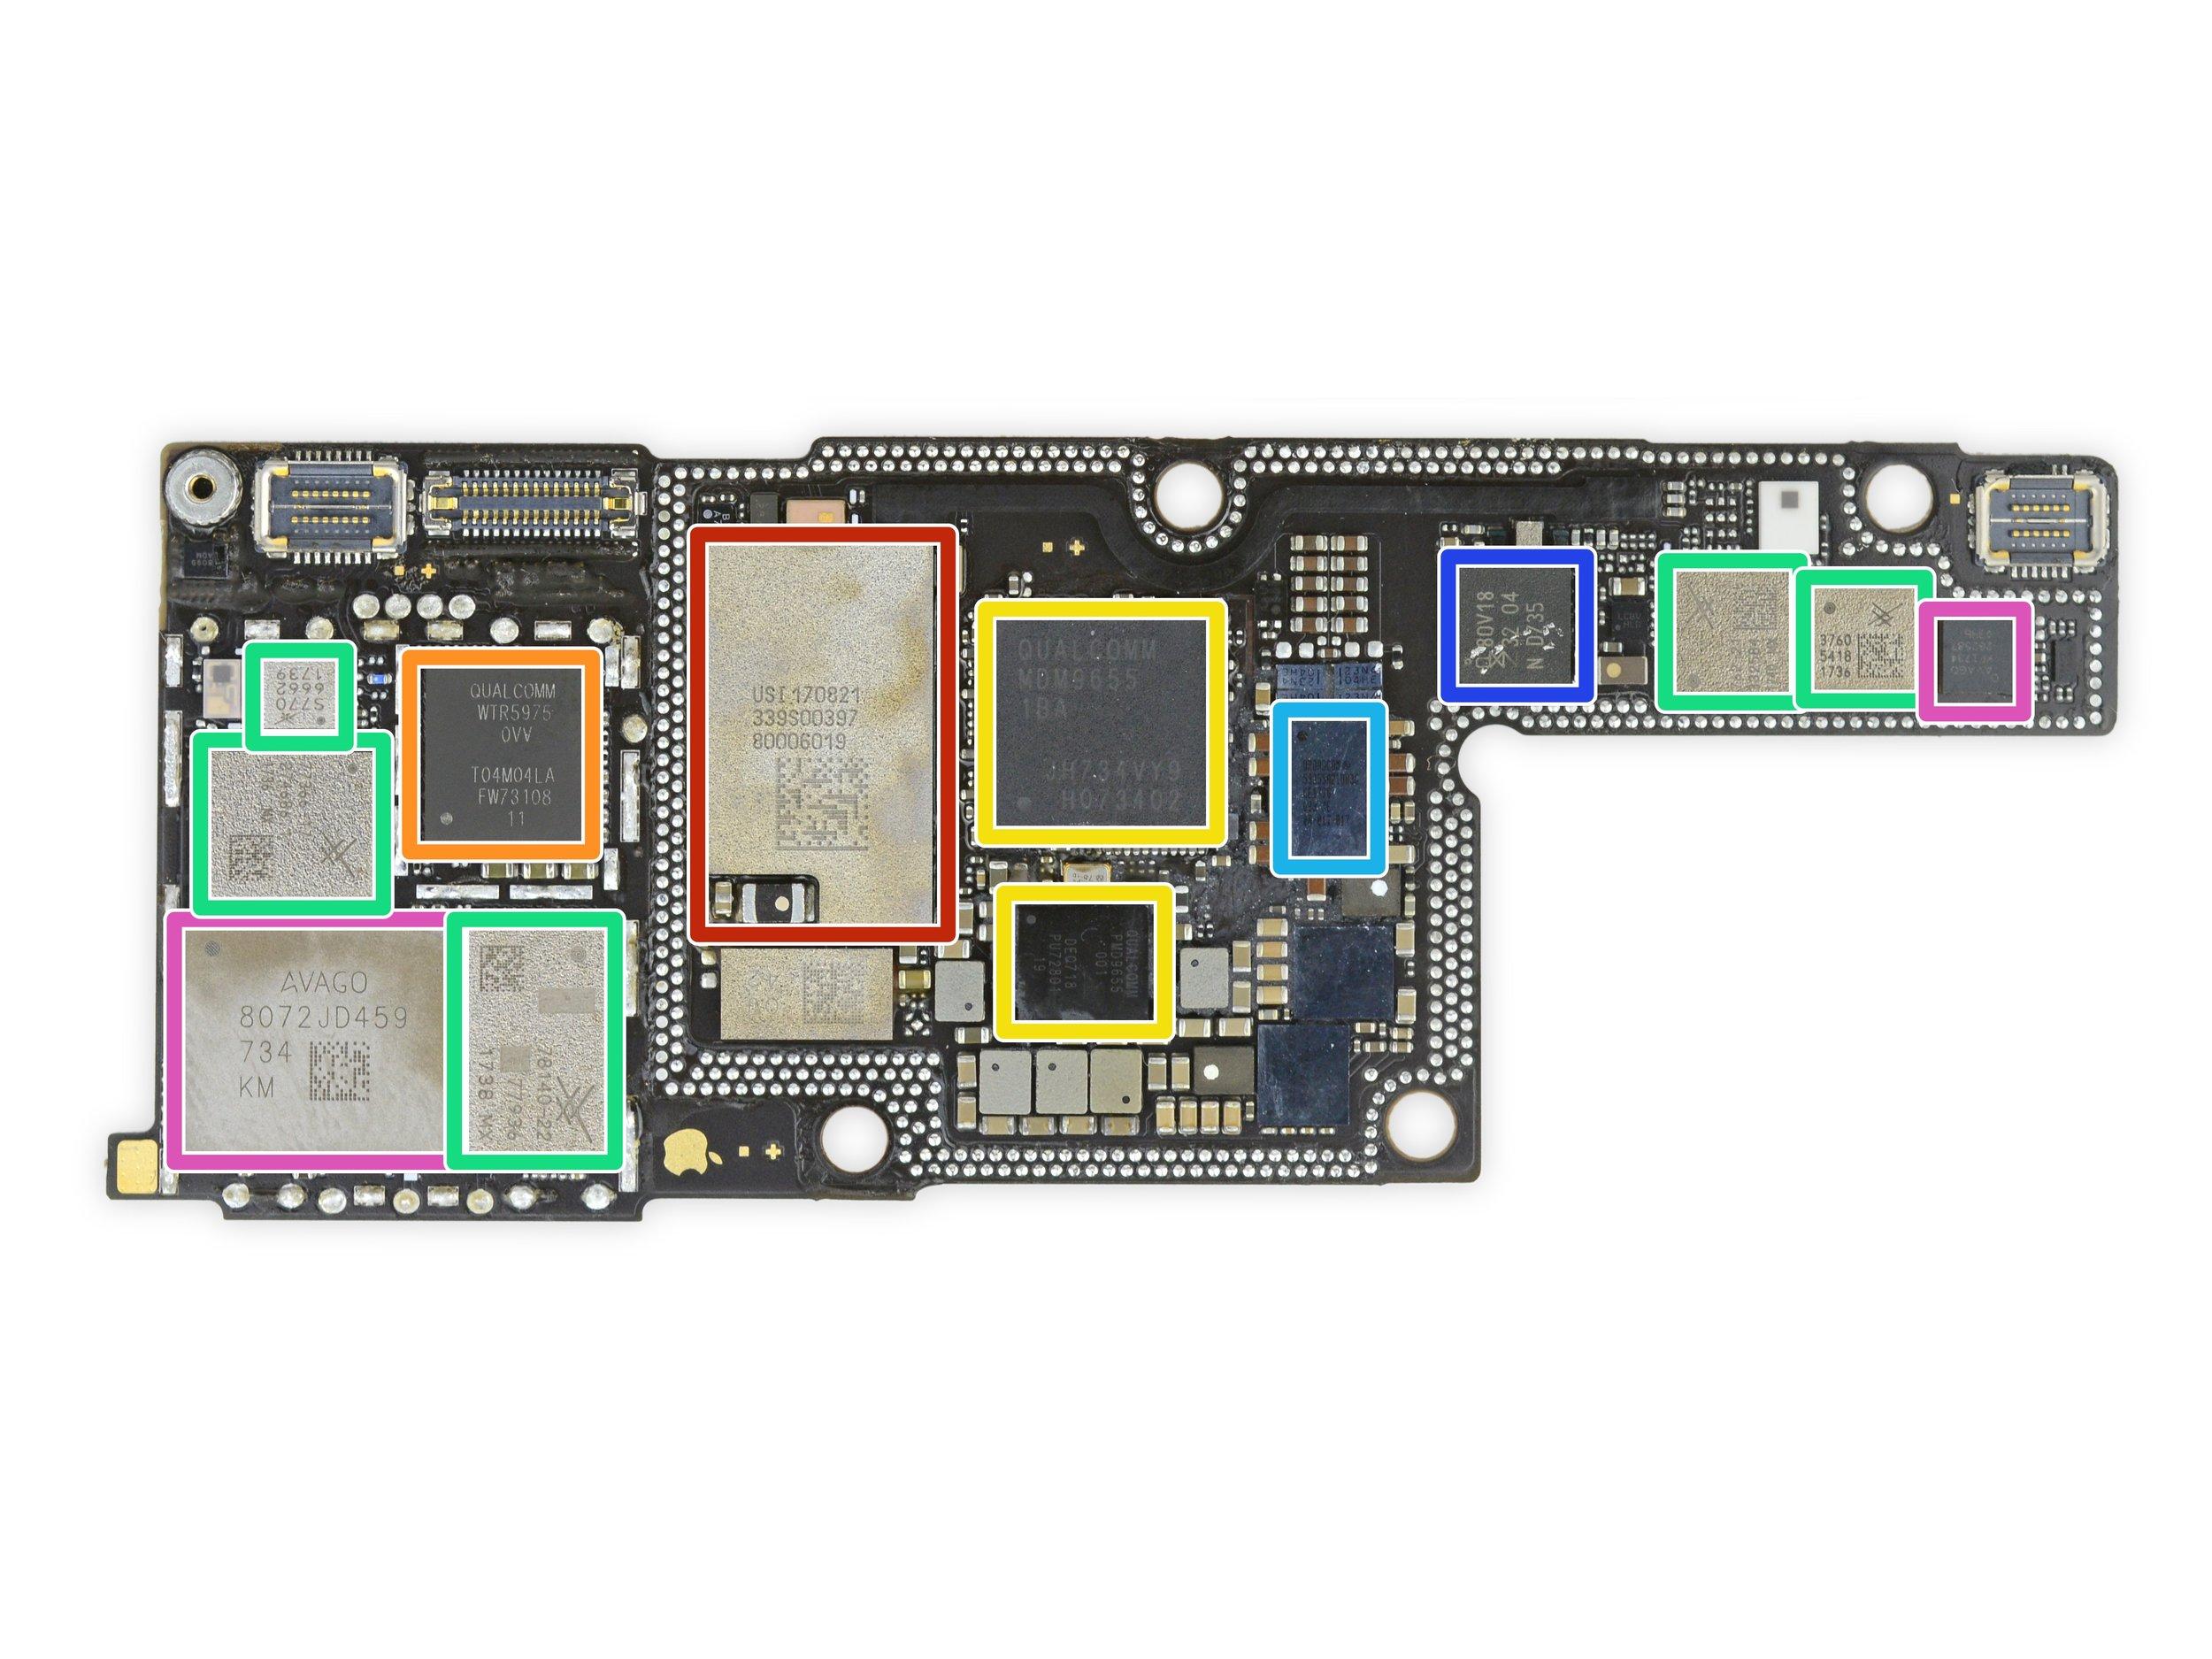 An iPhone X using Qualcomm MDM9655 Snapdragon X16 LTE modem (yellow). Source:  iFixit.com